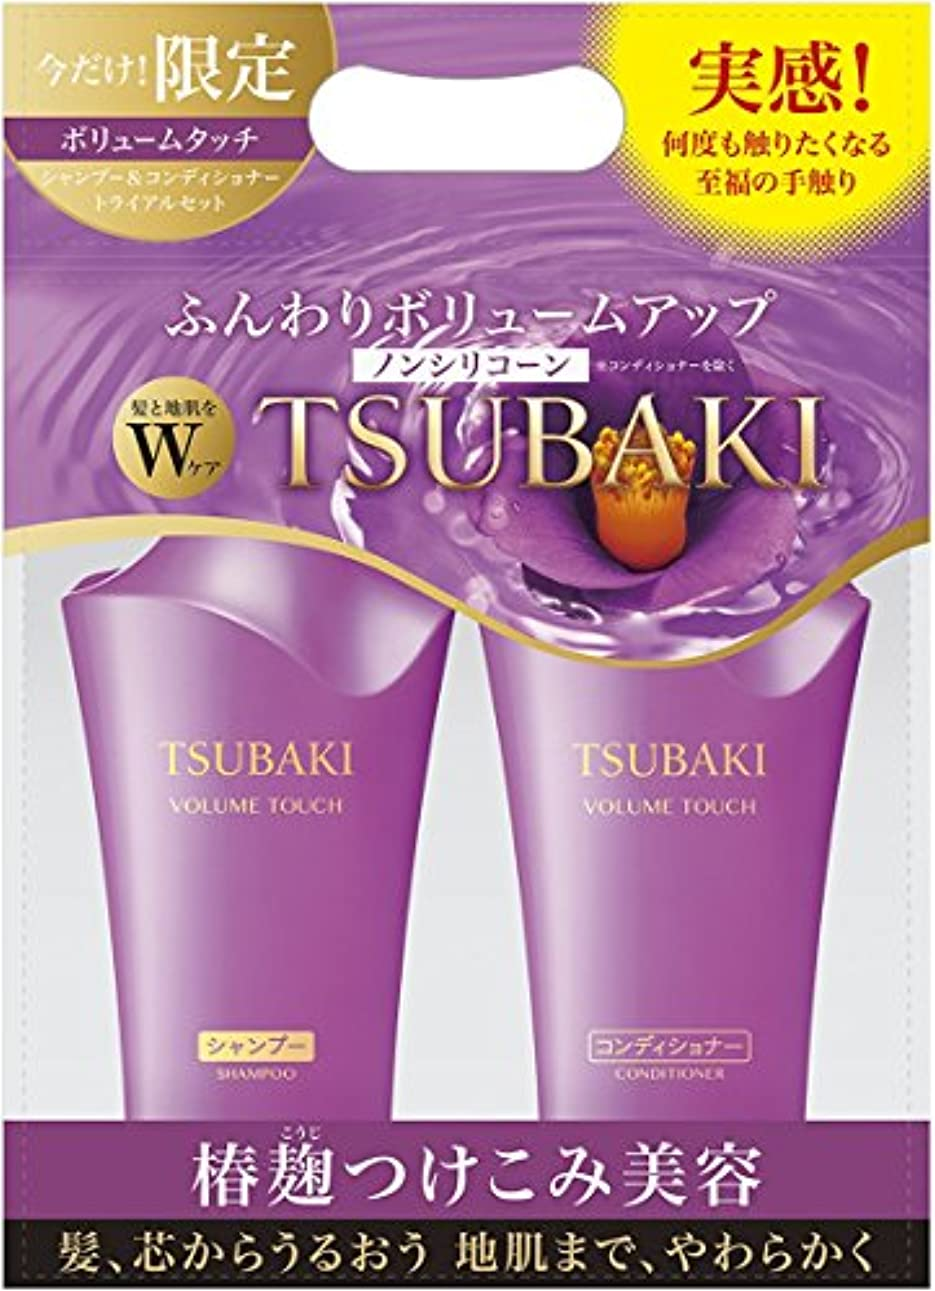 TSUBAKI ボリュームタッチ シャンプー&コンディショナー ジャンボペアセット (500ml+500ml)